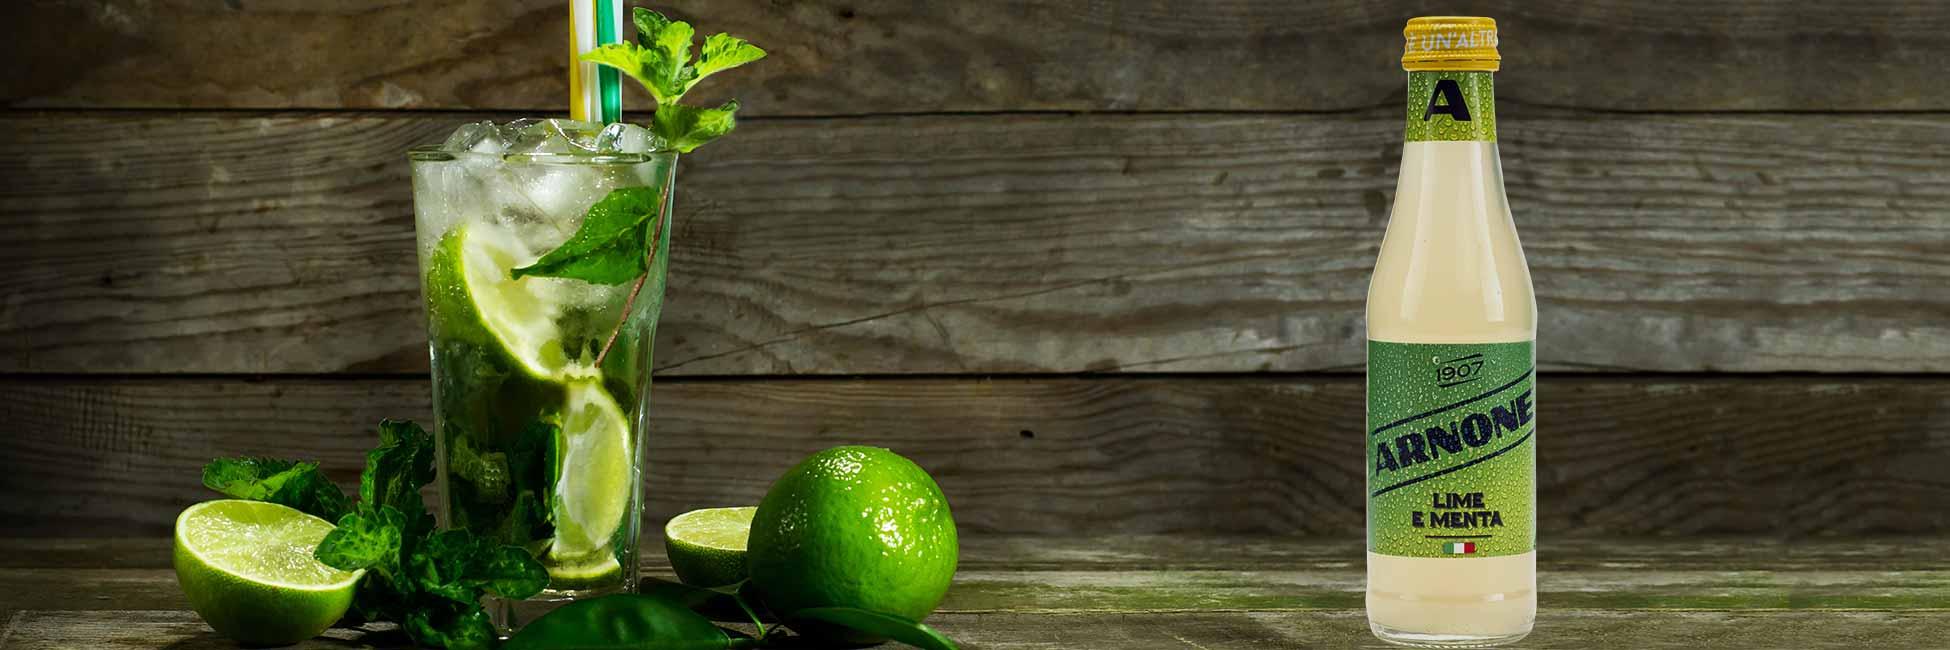 slide-con-lime-menta-arnone-autunno